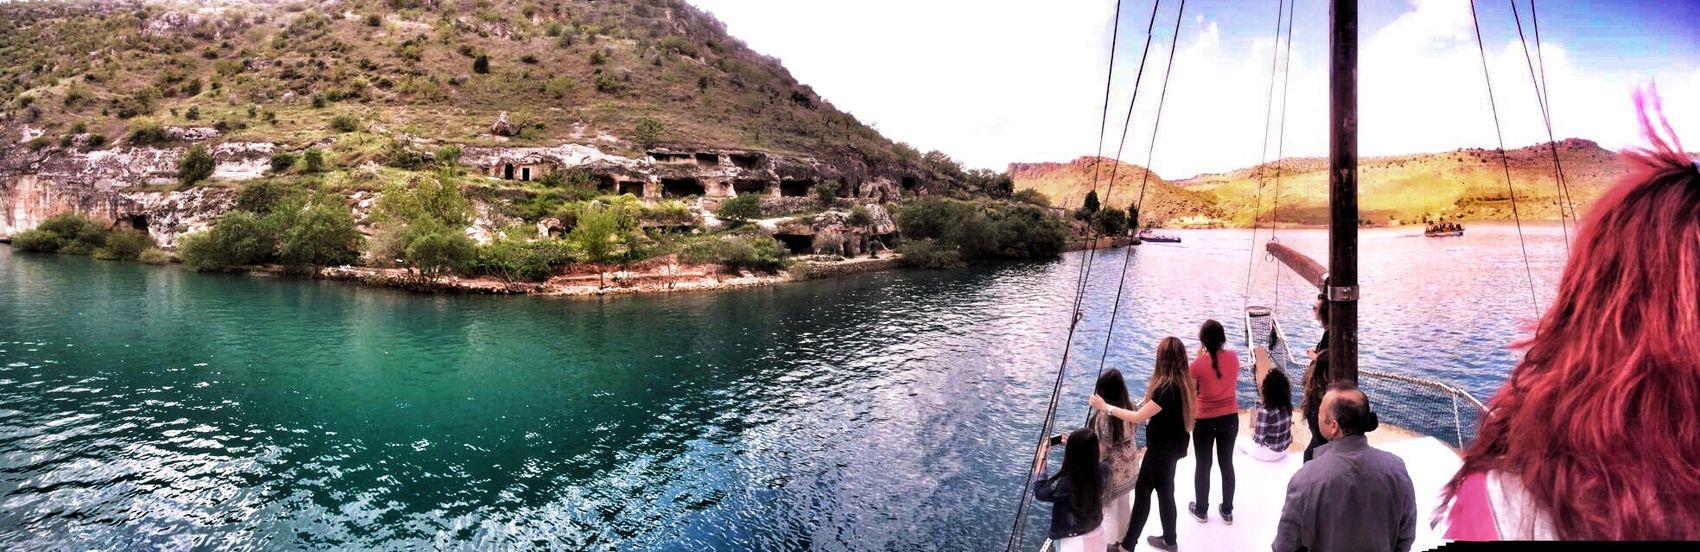 Tb :) Check This Out Hello World Taking Photos Enjoying Life Şanlıurfa Halfeti Panoromic Mobilephotography Lake